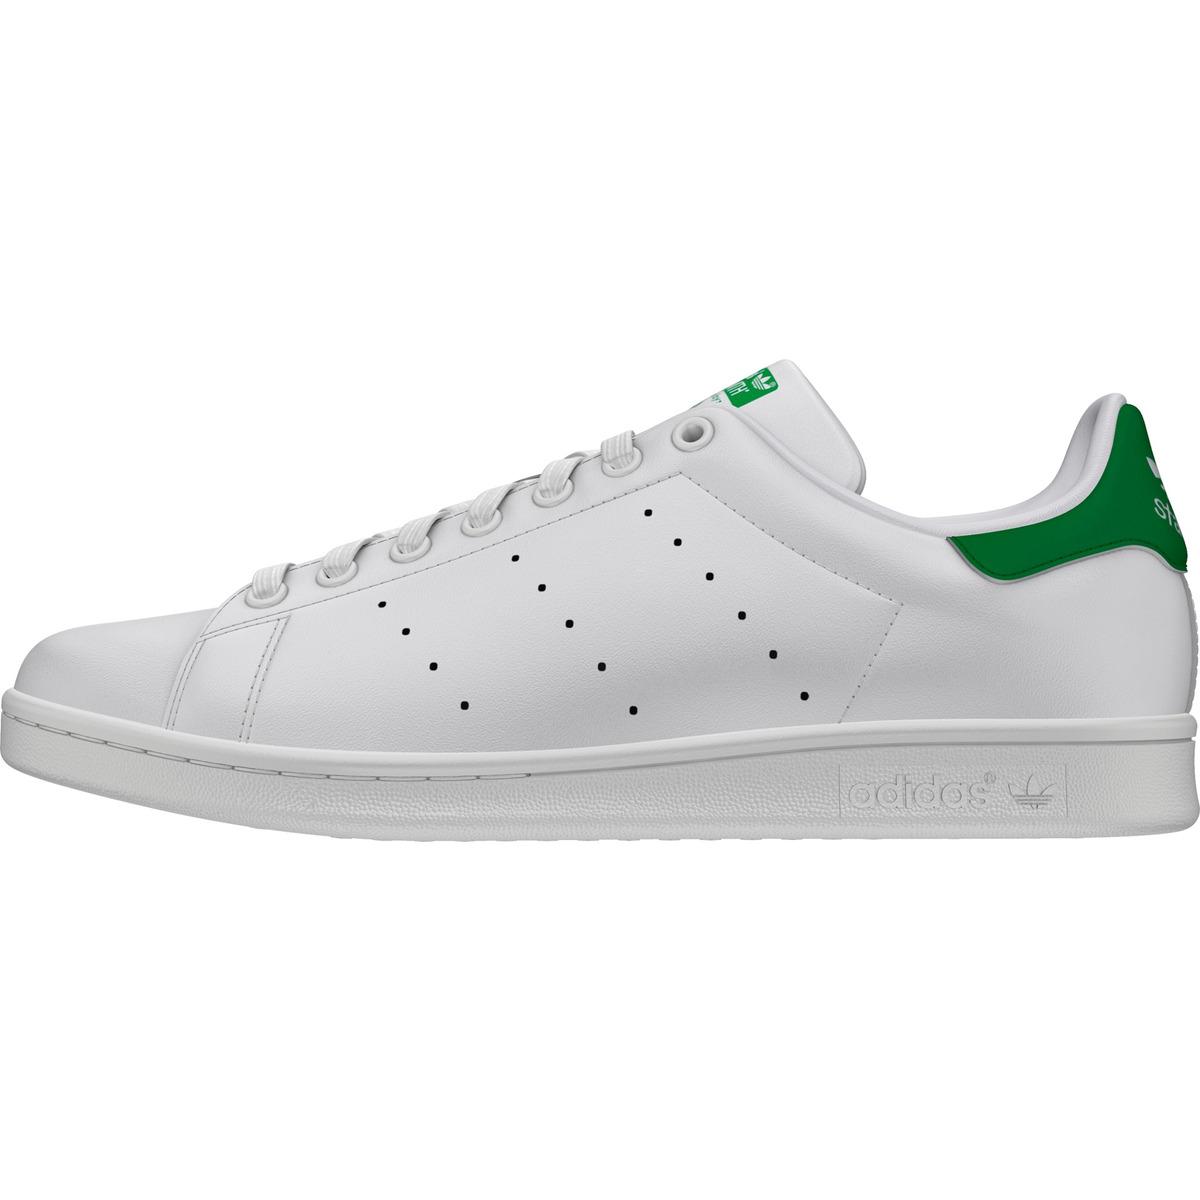 8a2077da4 Zapatillas adidas Originals Stan Smith-m20324 - $ 2.999,00 en ...